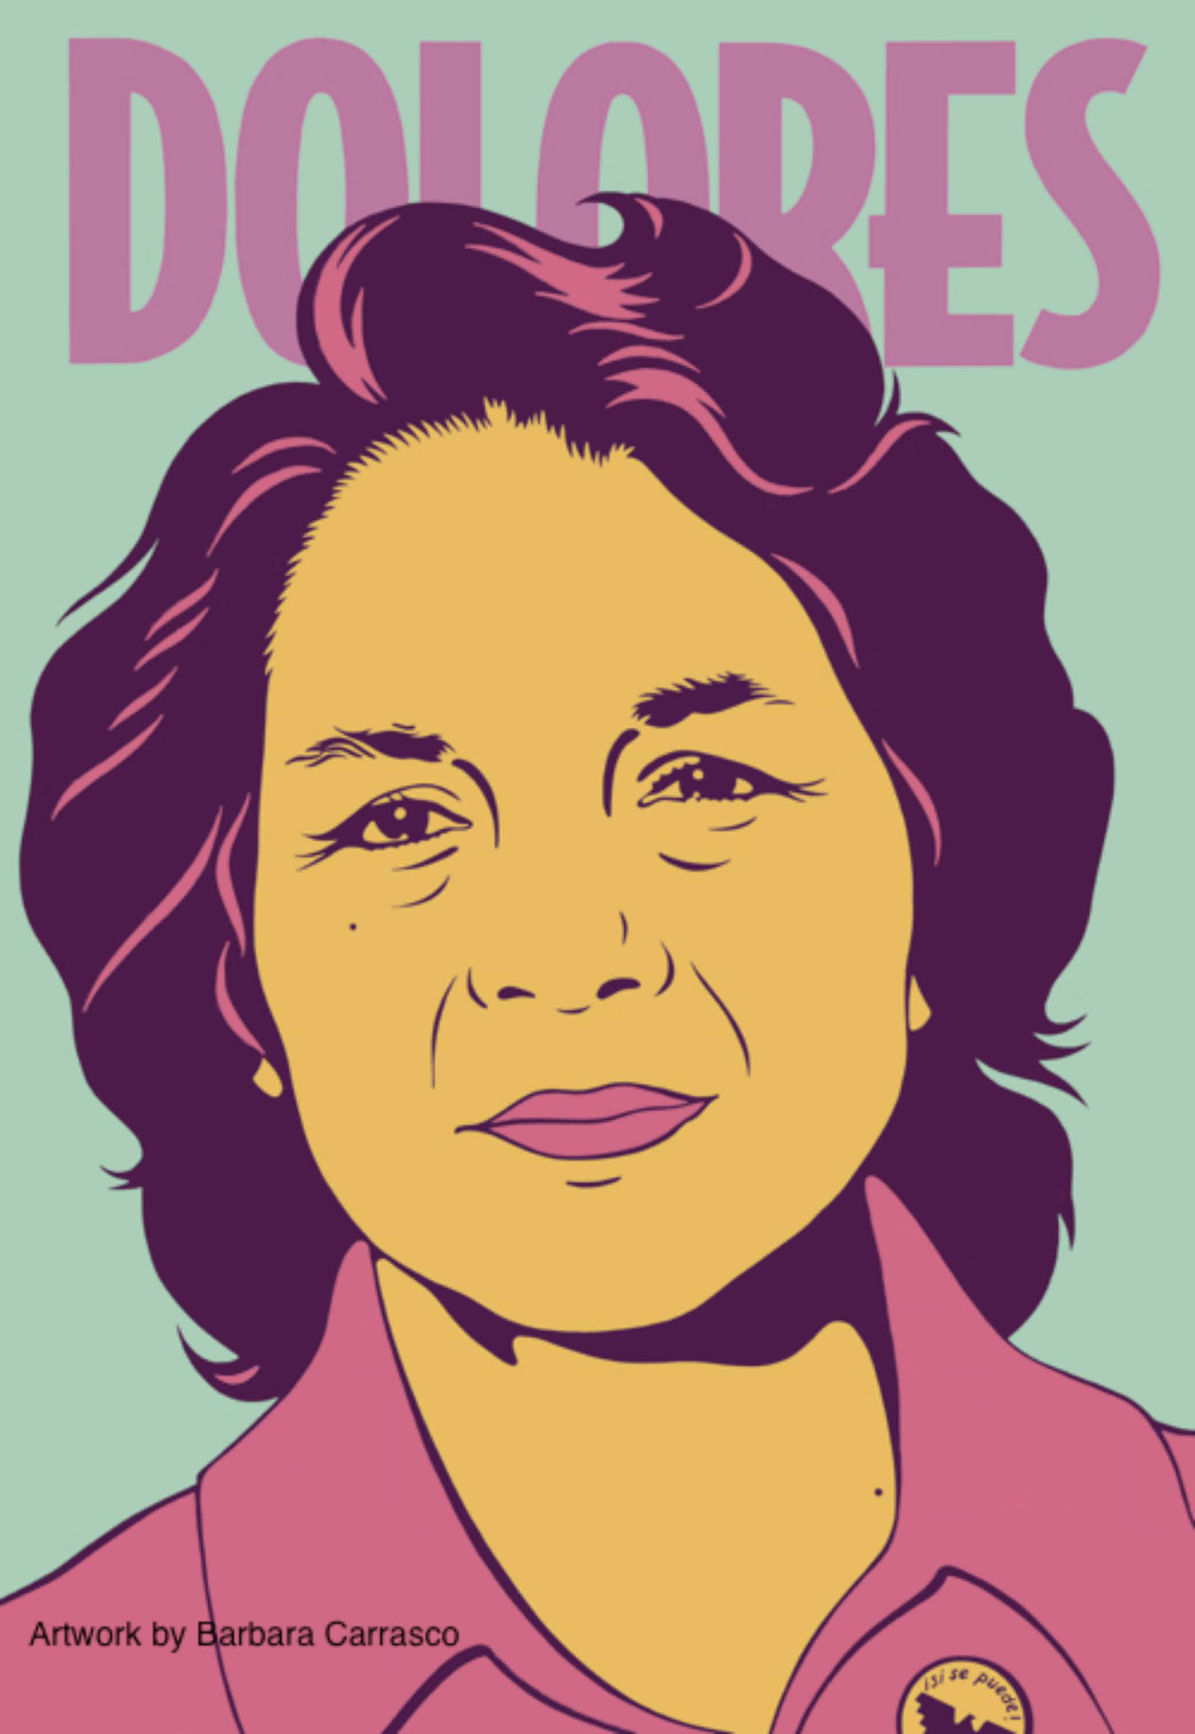 Barbara Carrasco of Dolores